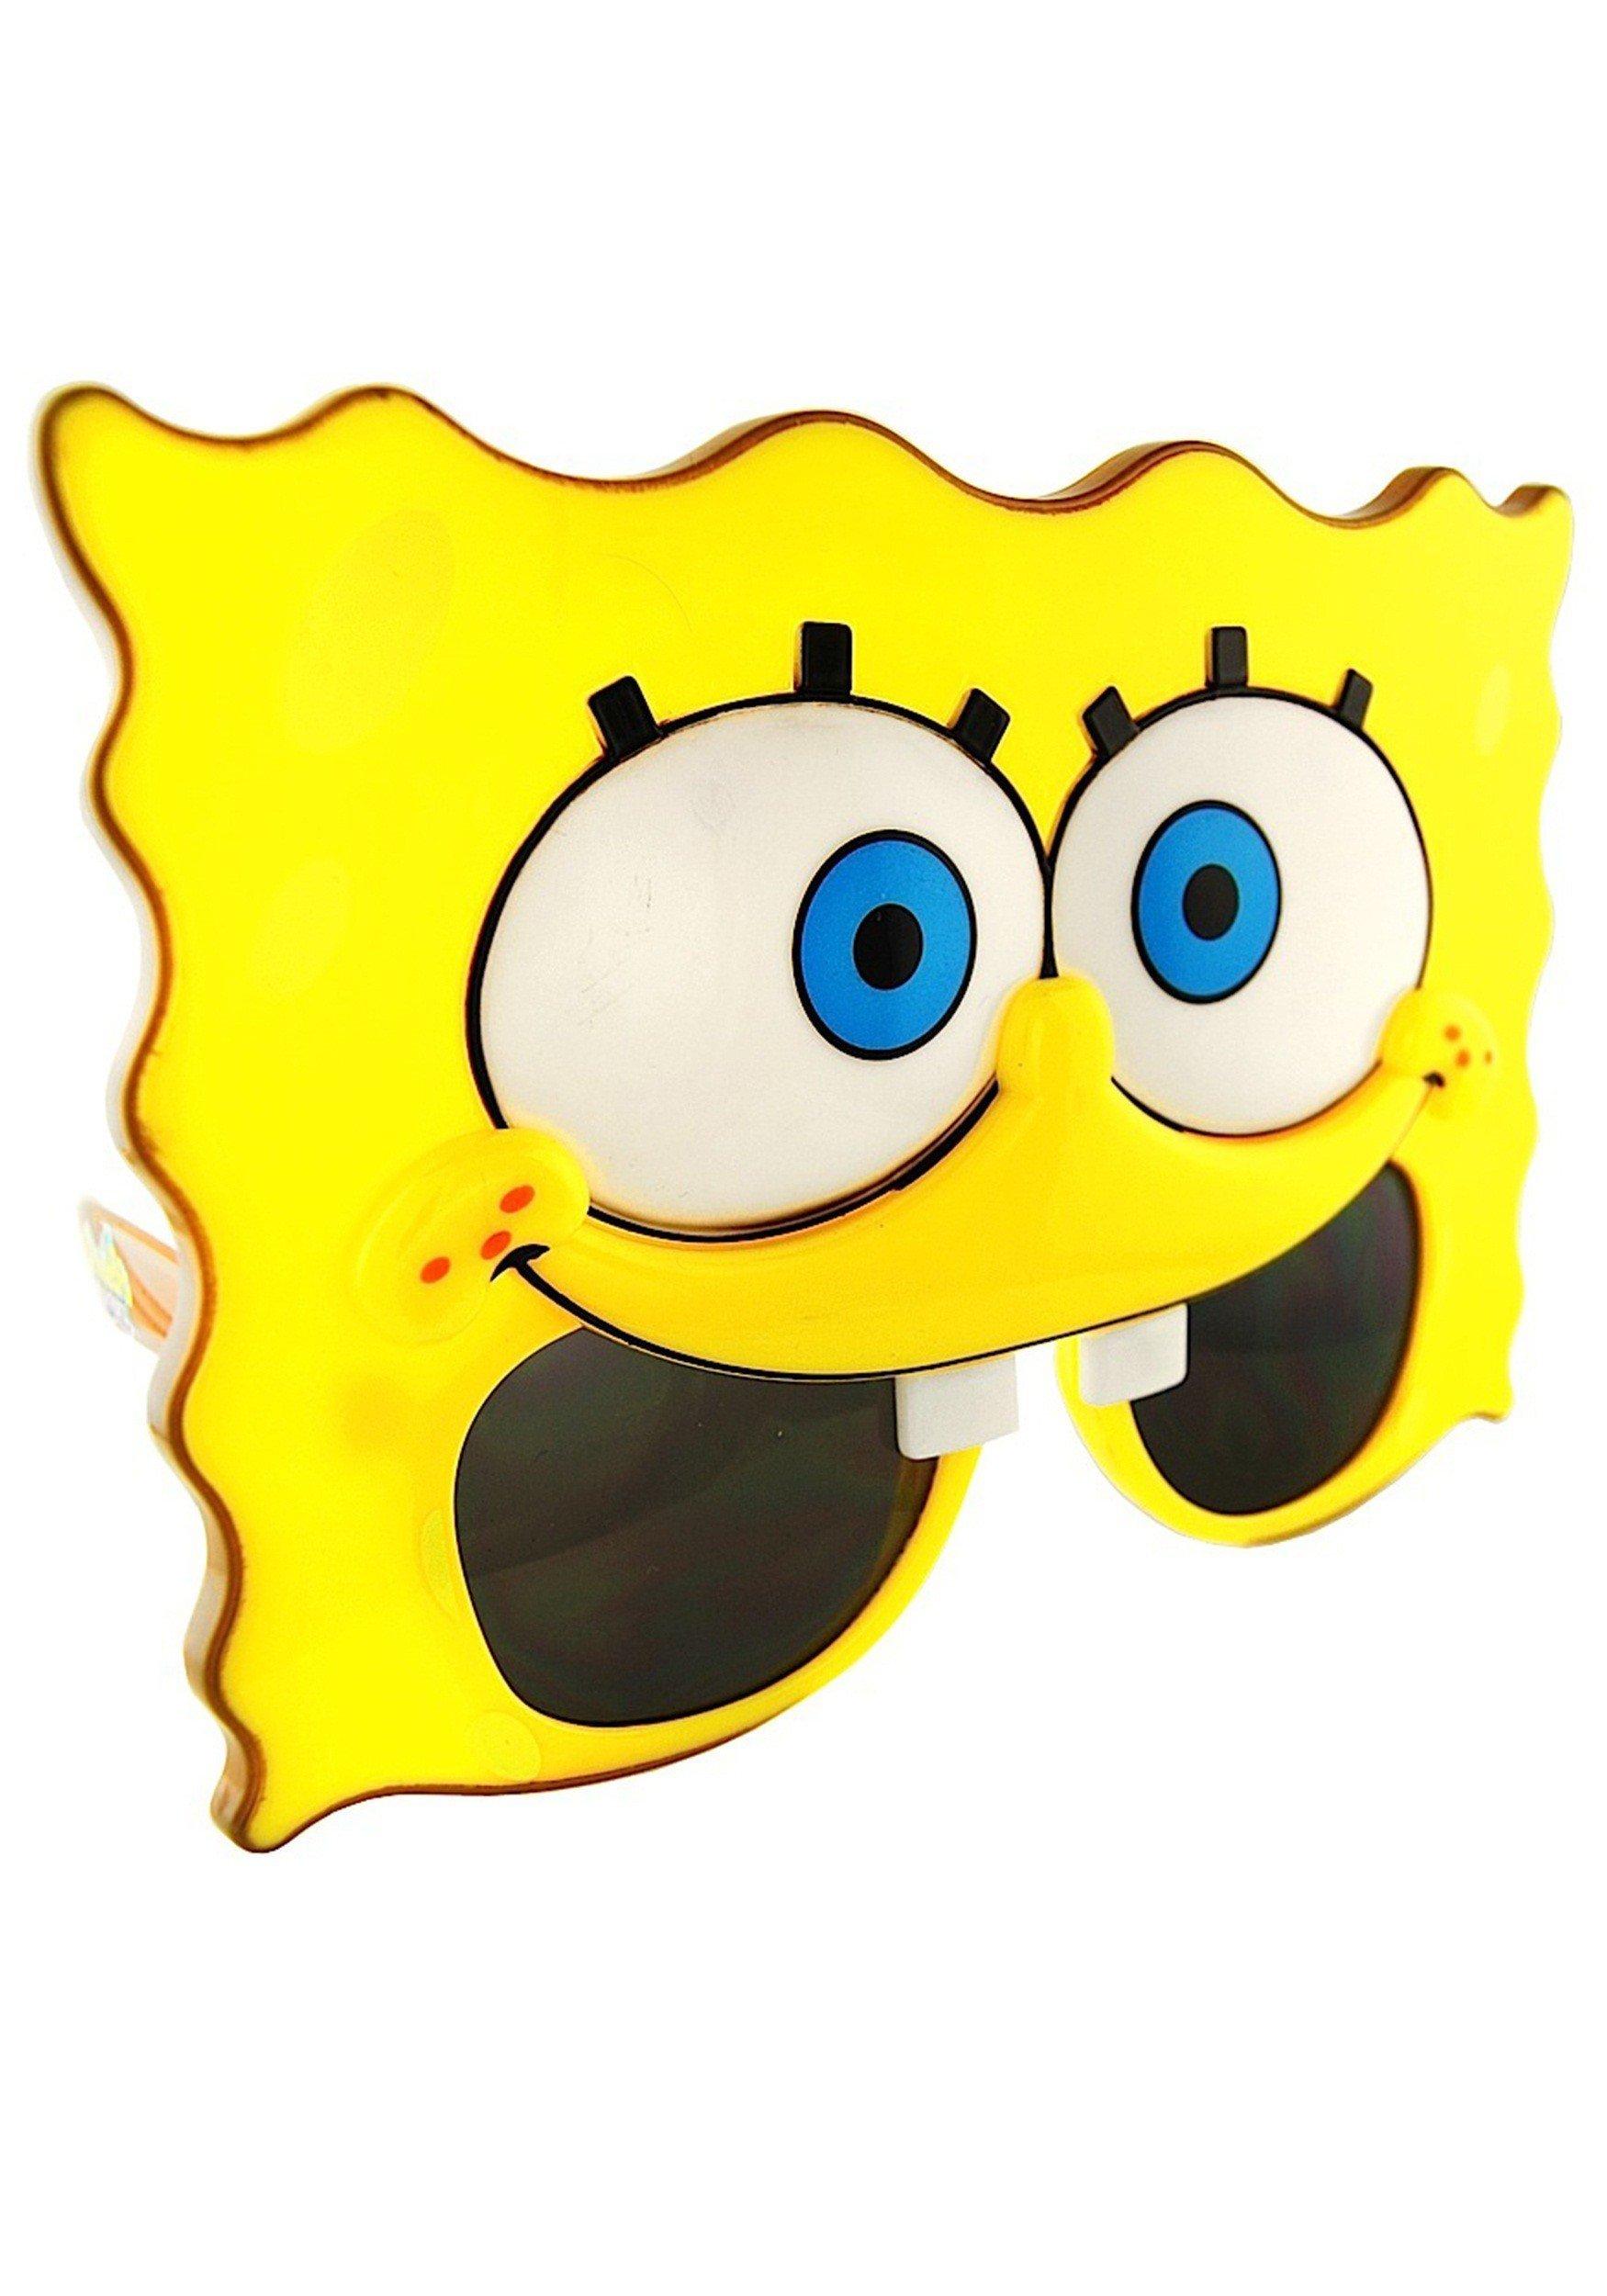 Costume Sunglasses SpongeBob SquarePants Sun-Staches Party Favors UV400